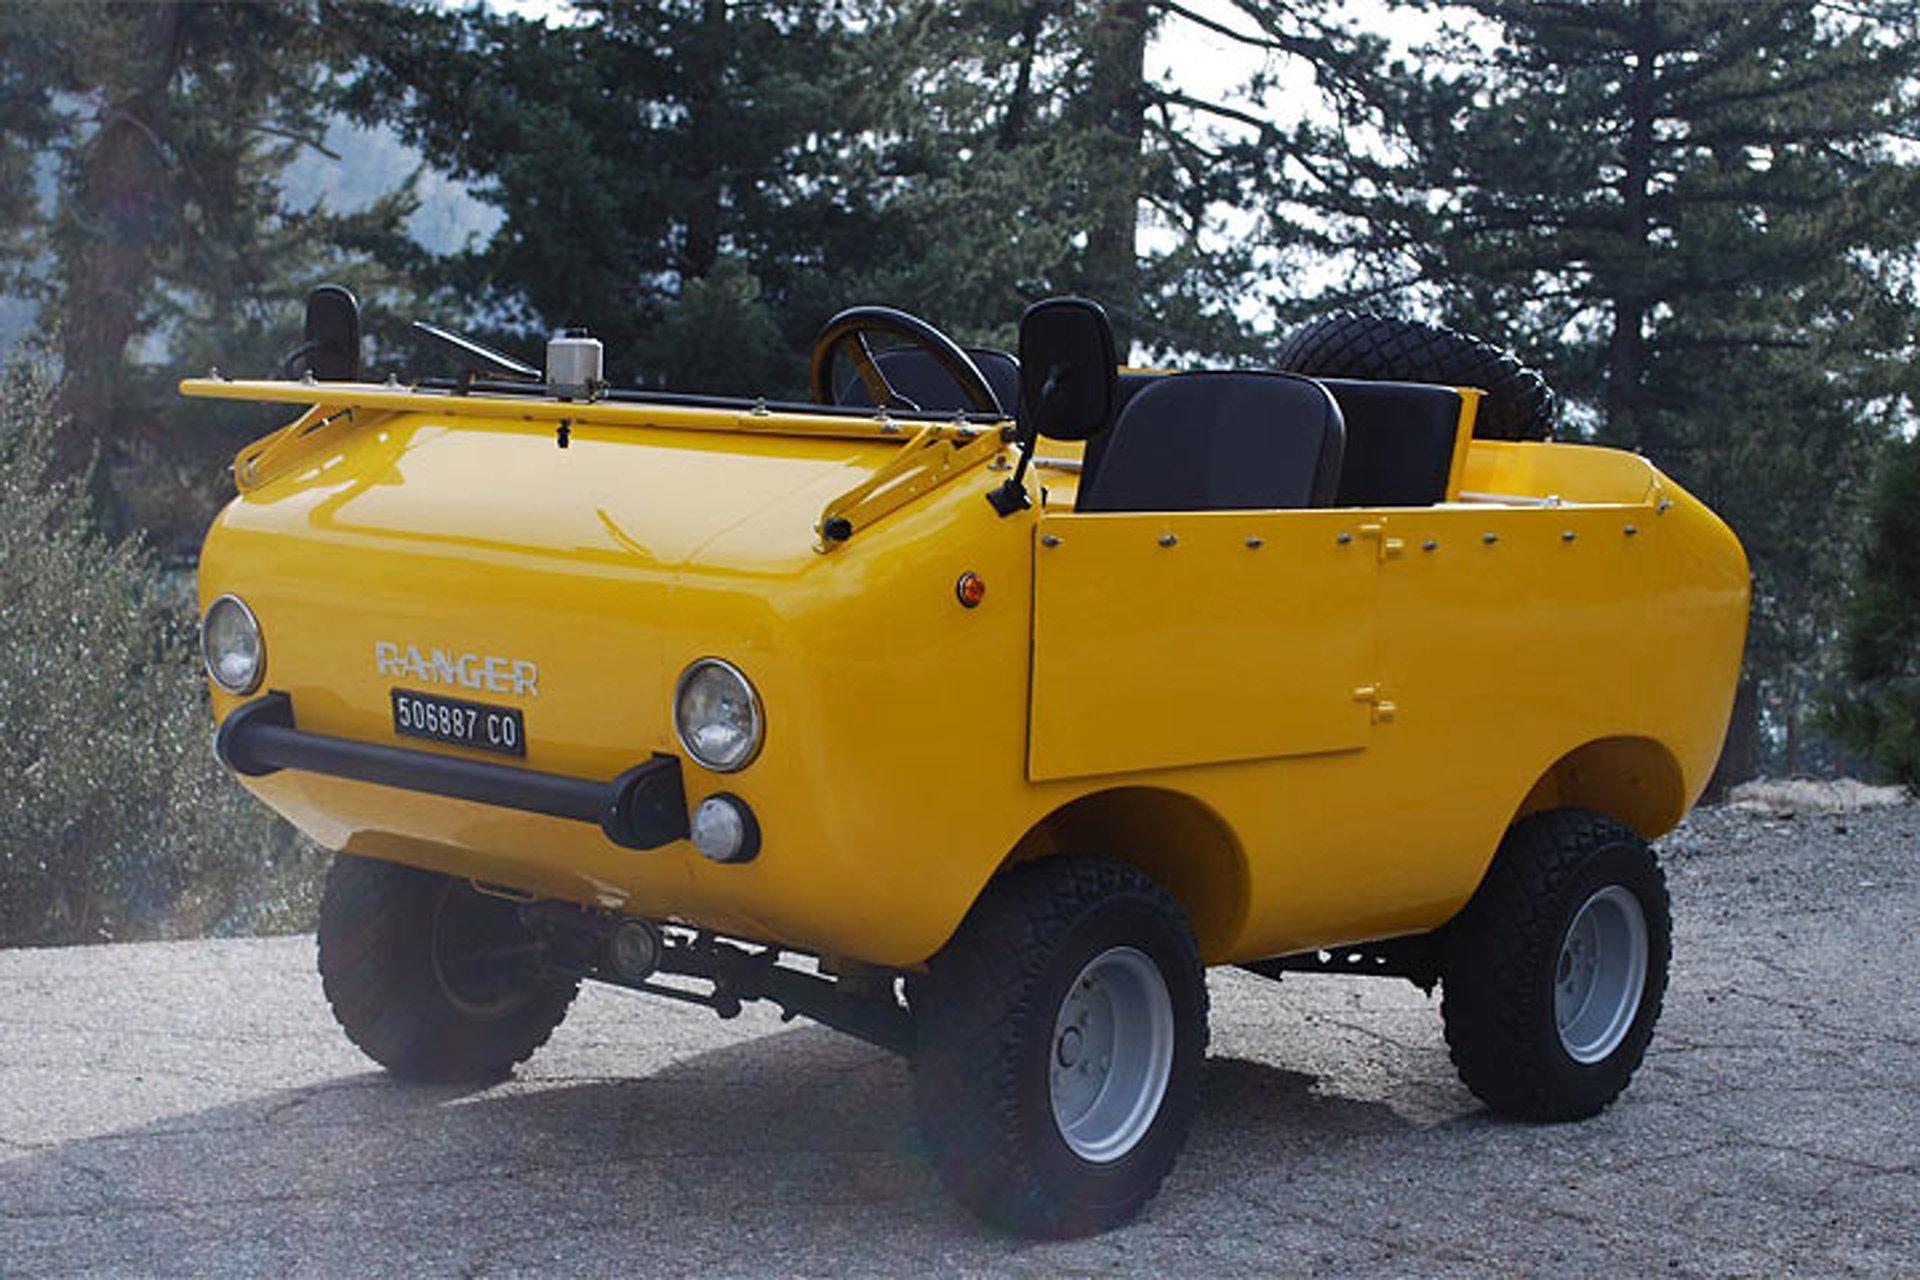 eBay Find 'Ranger' Off-Roader is Pretty Much a Fiat 500 on Steroids